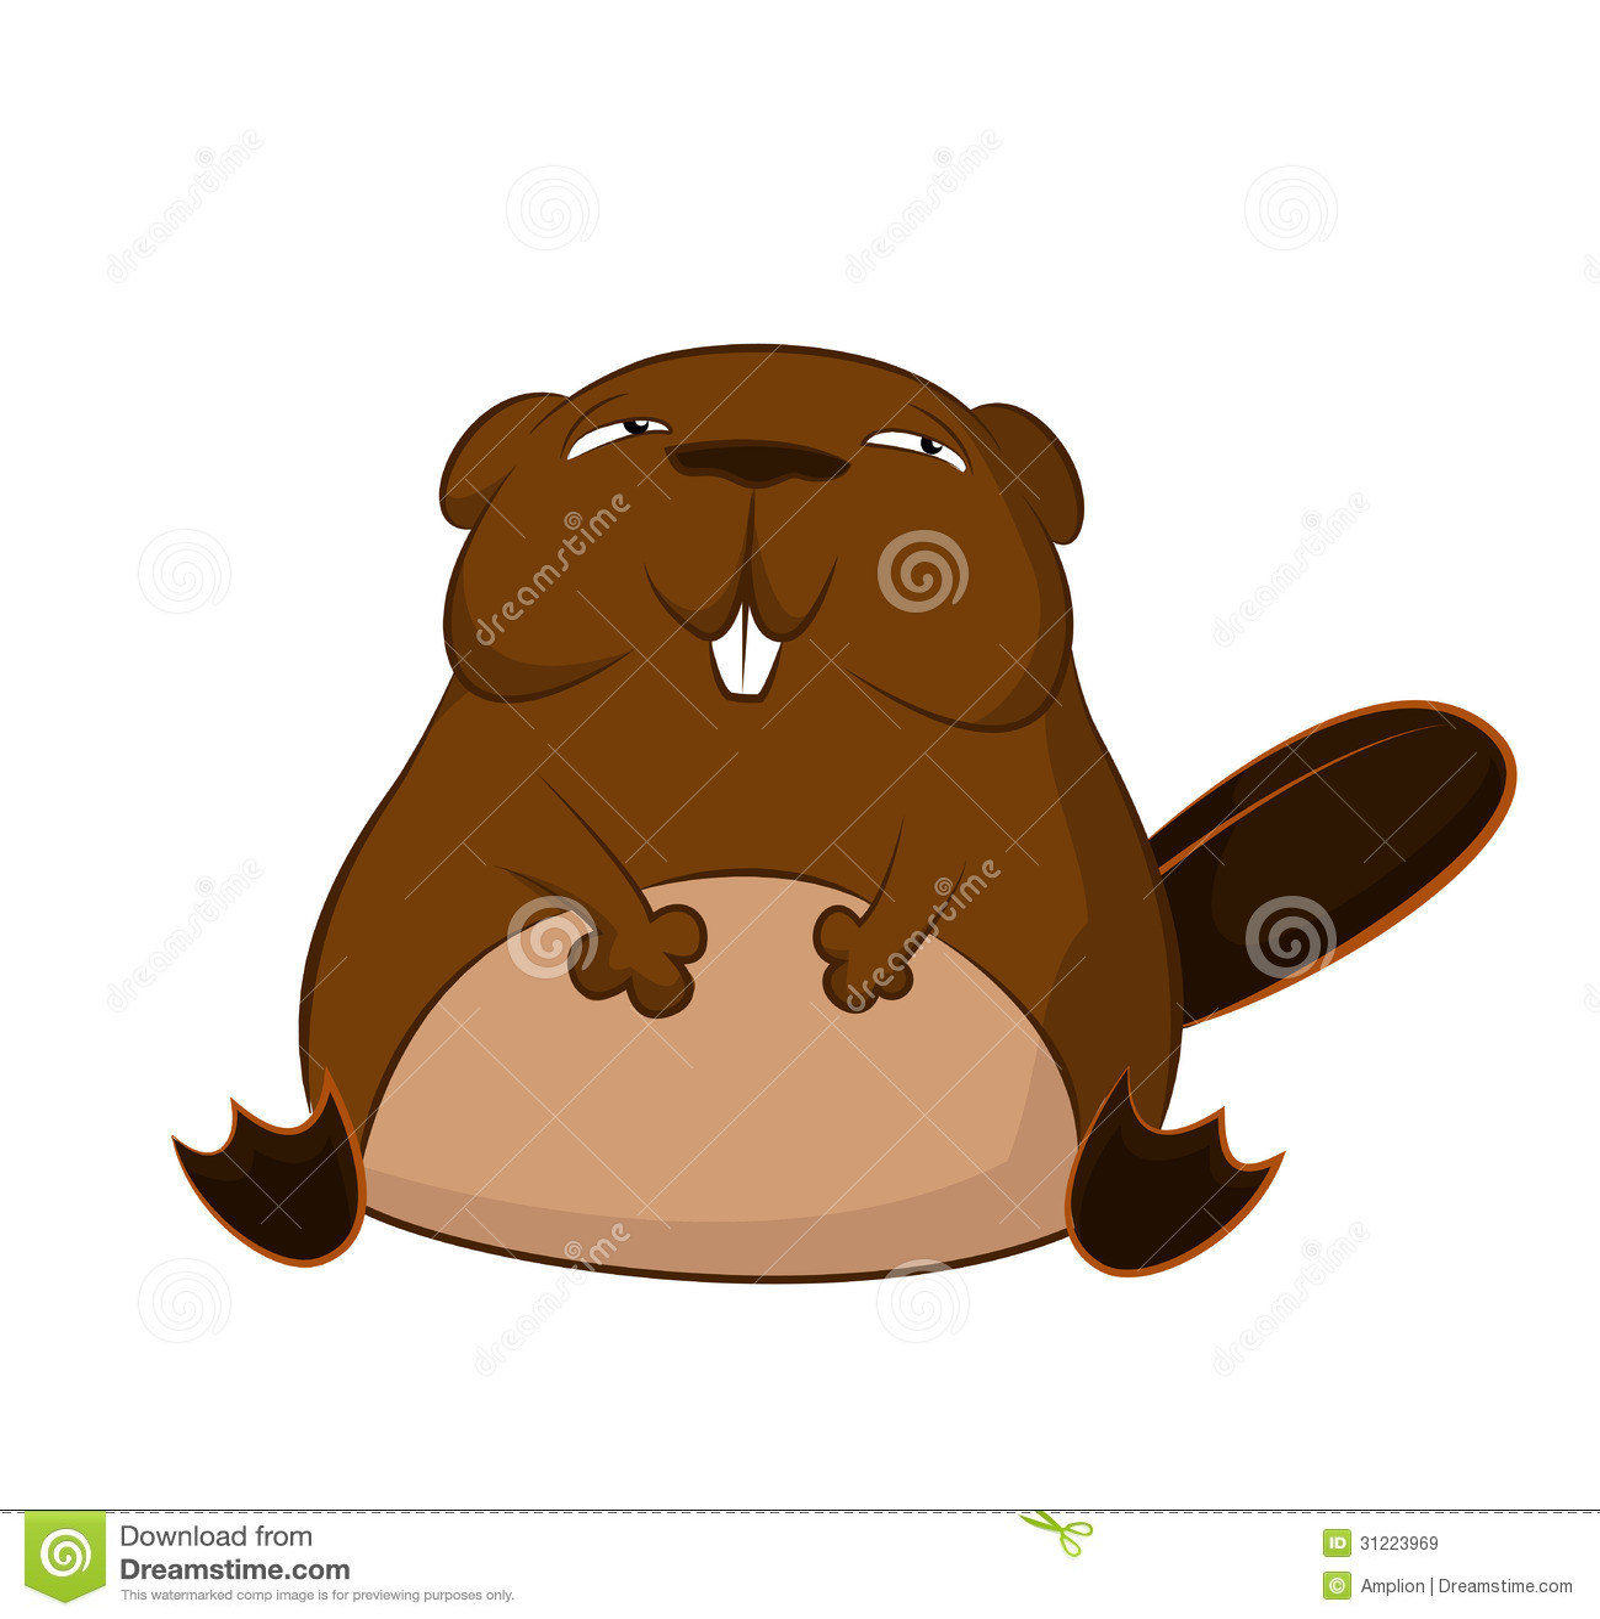 Funny cartoon beaver royalty free stock images image 31223969